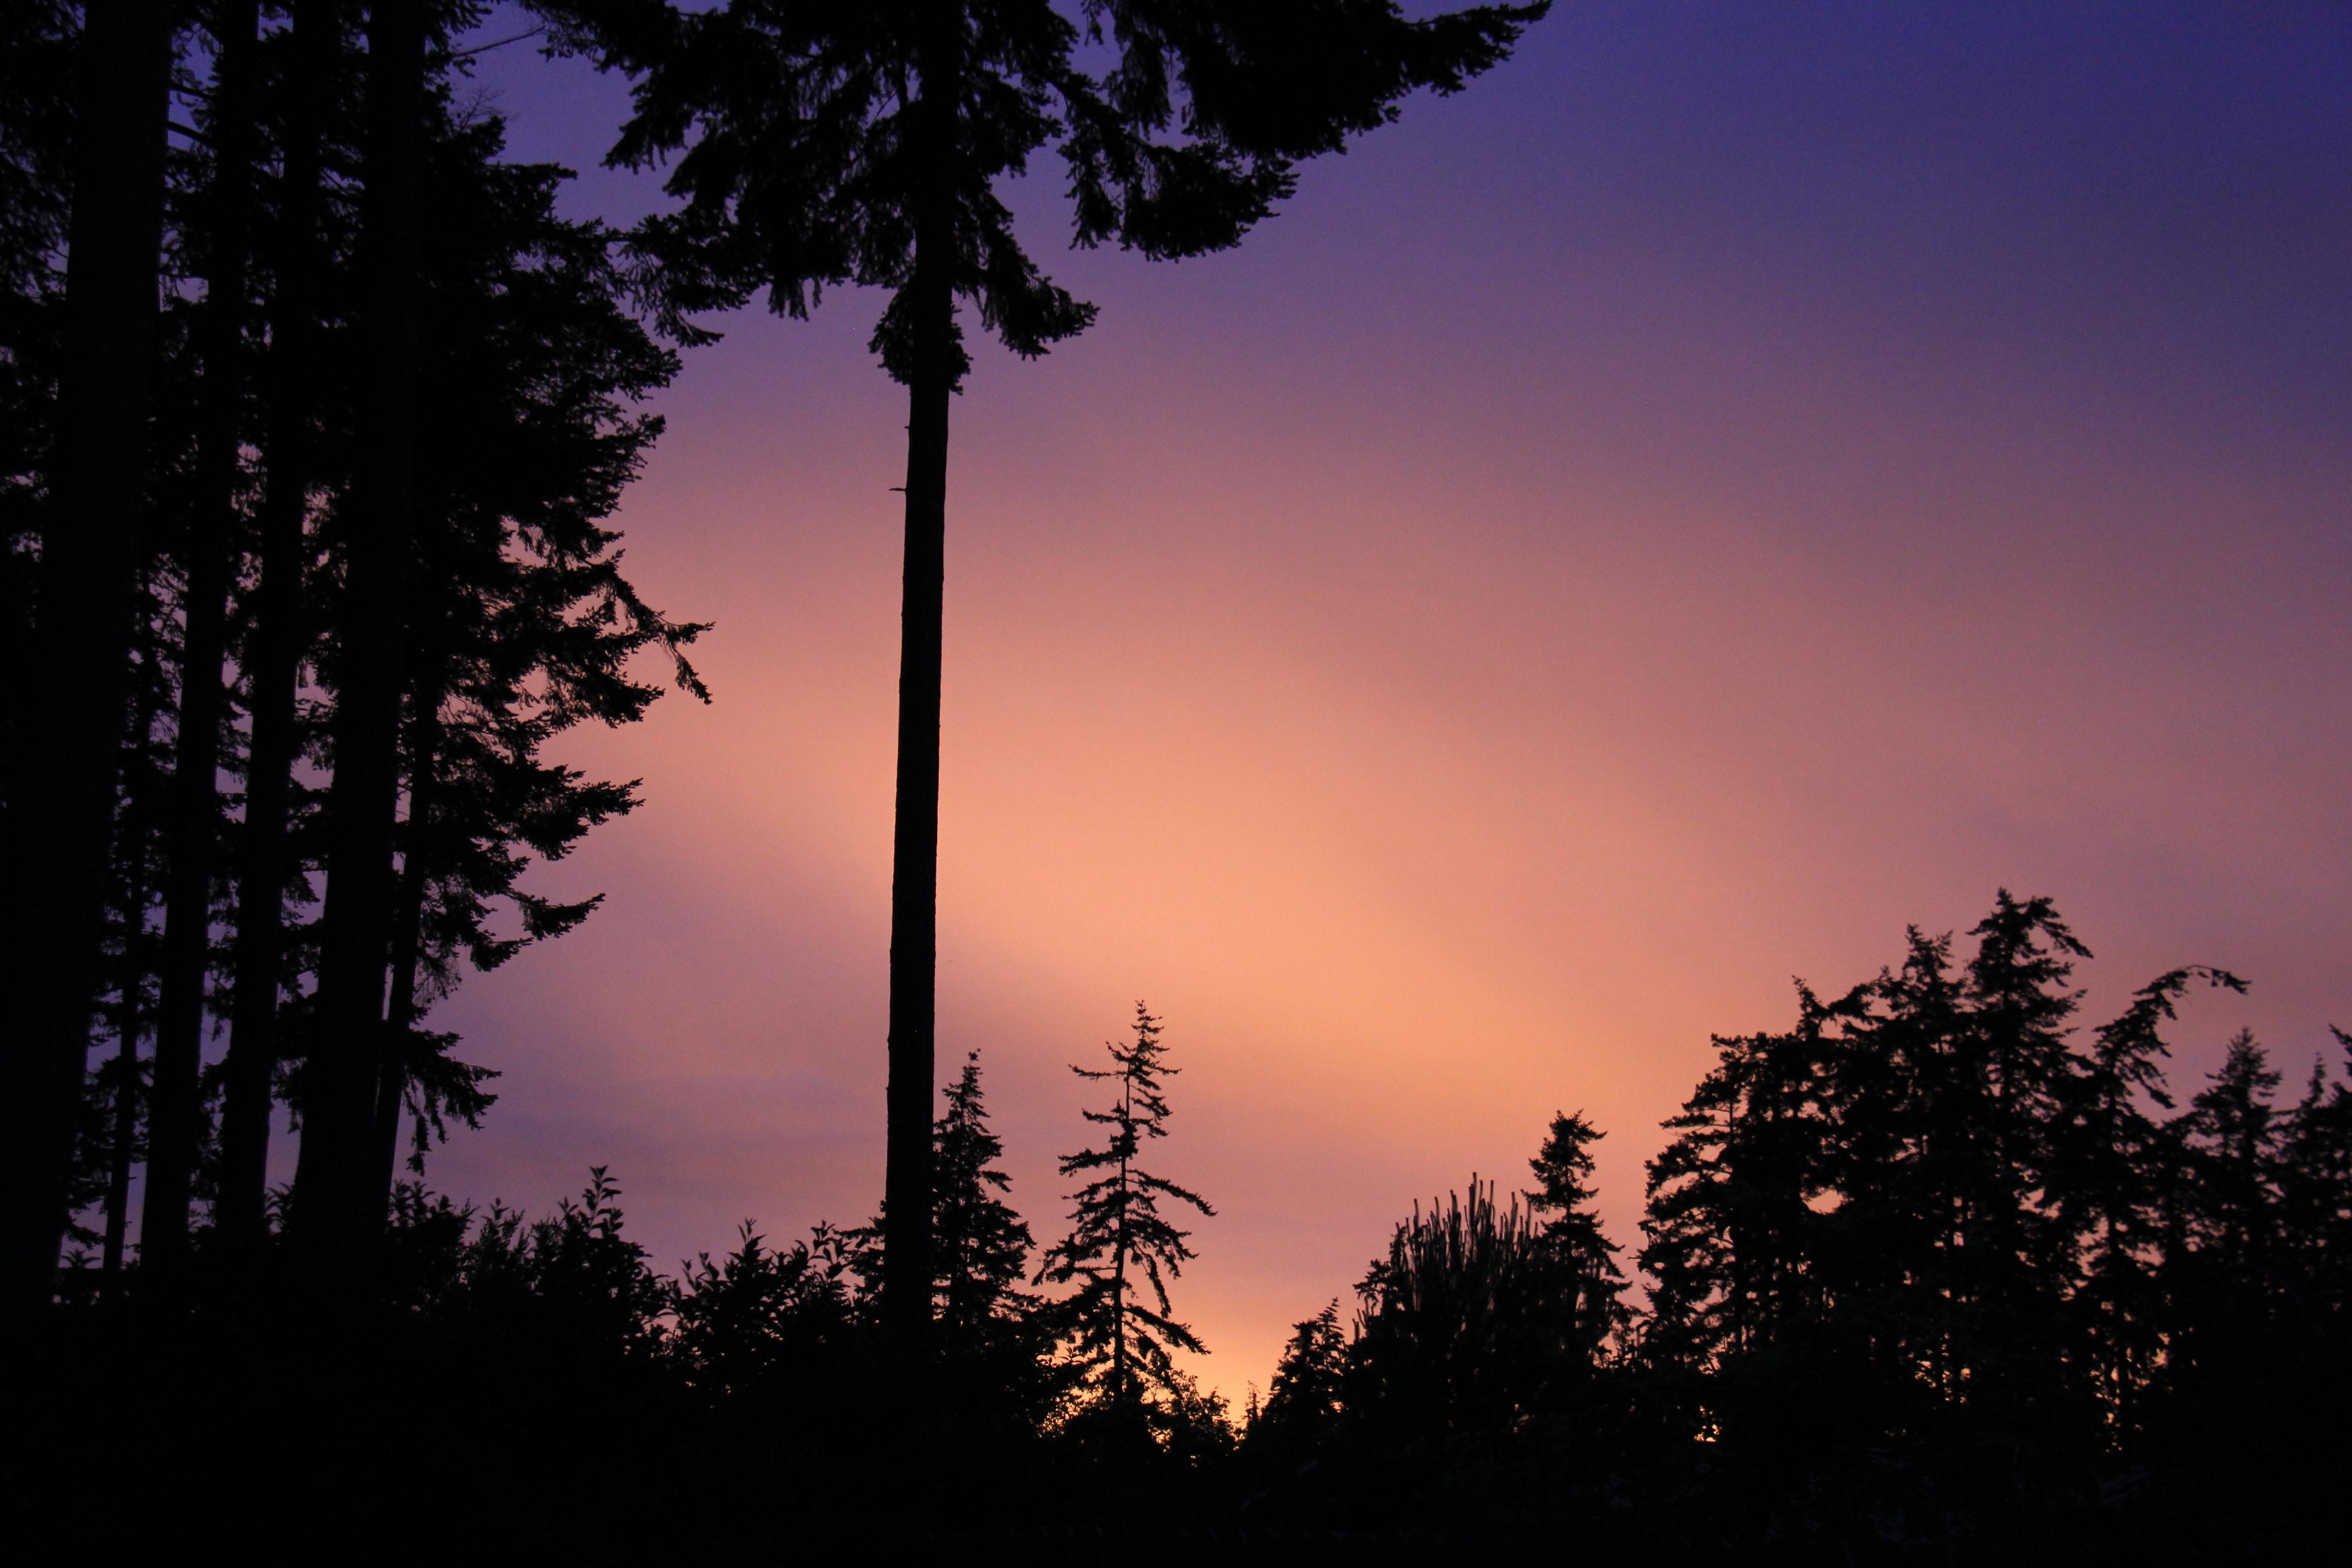 13 June sunset 2